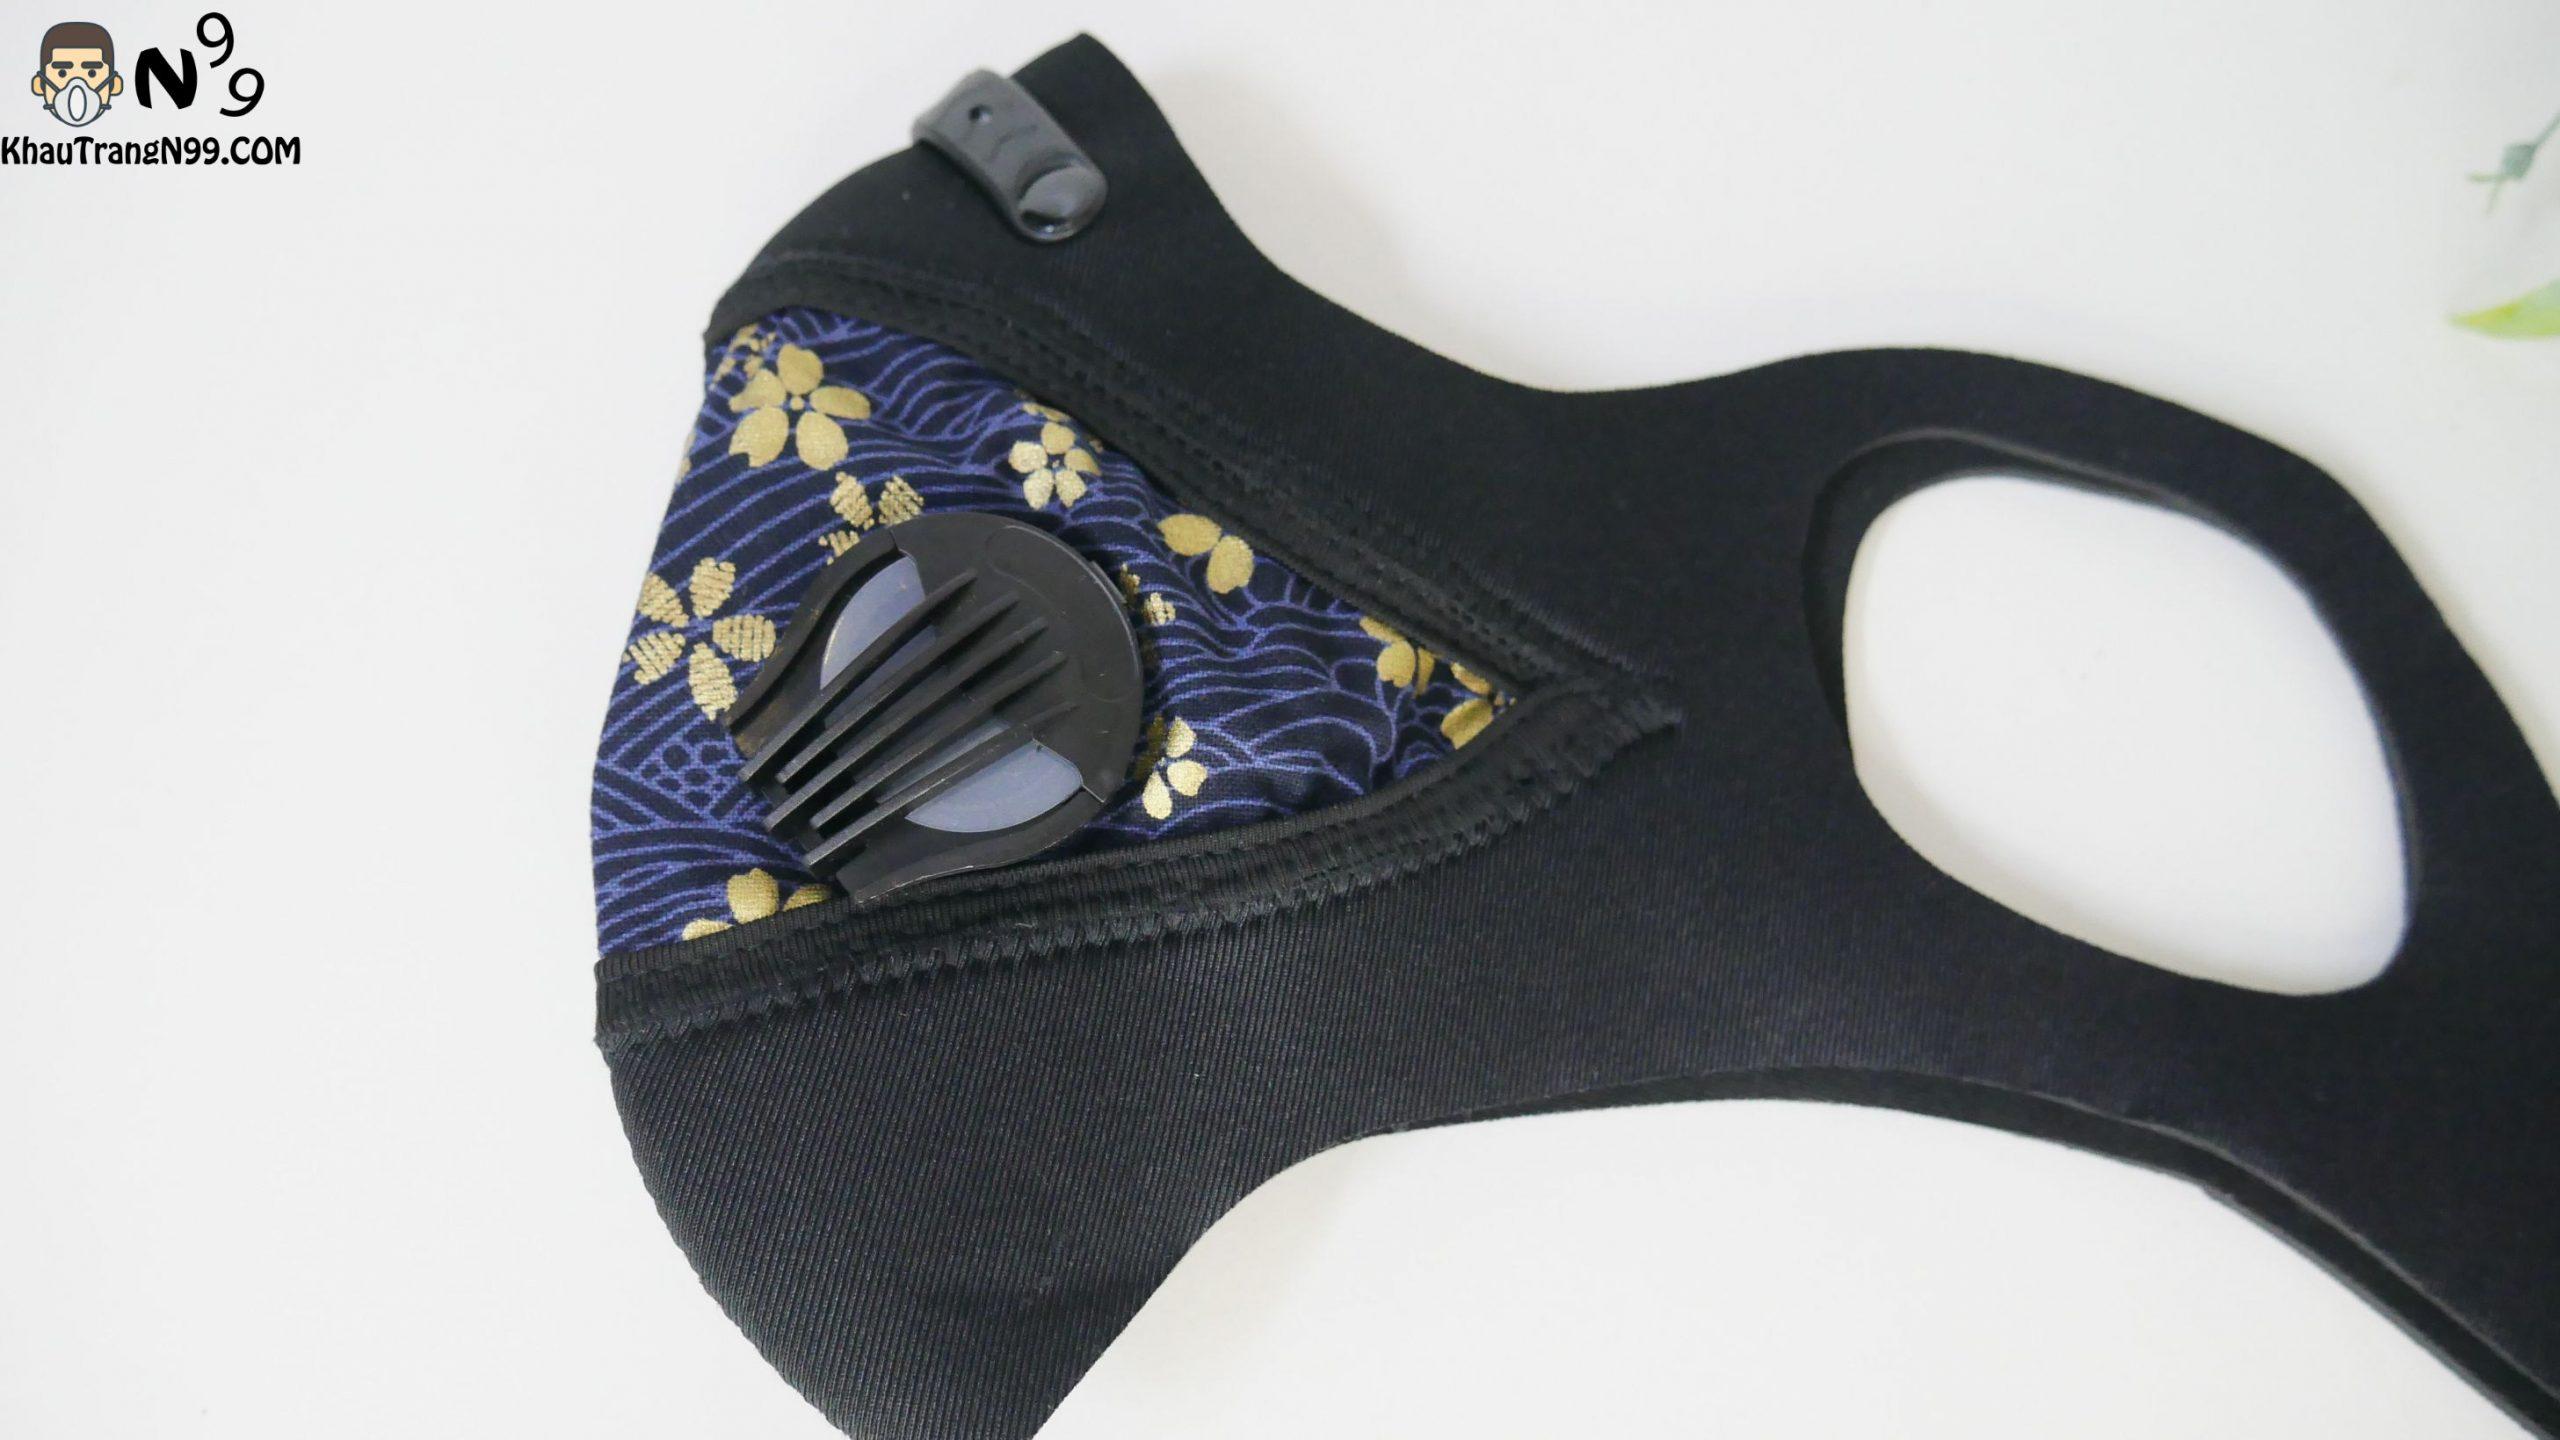 khẩu trang cao cấp VERO Ninja (3)